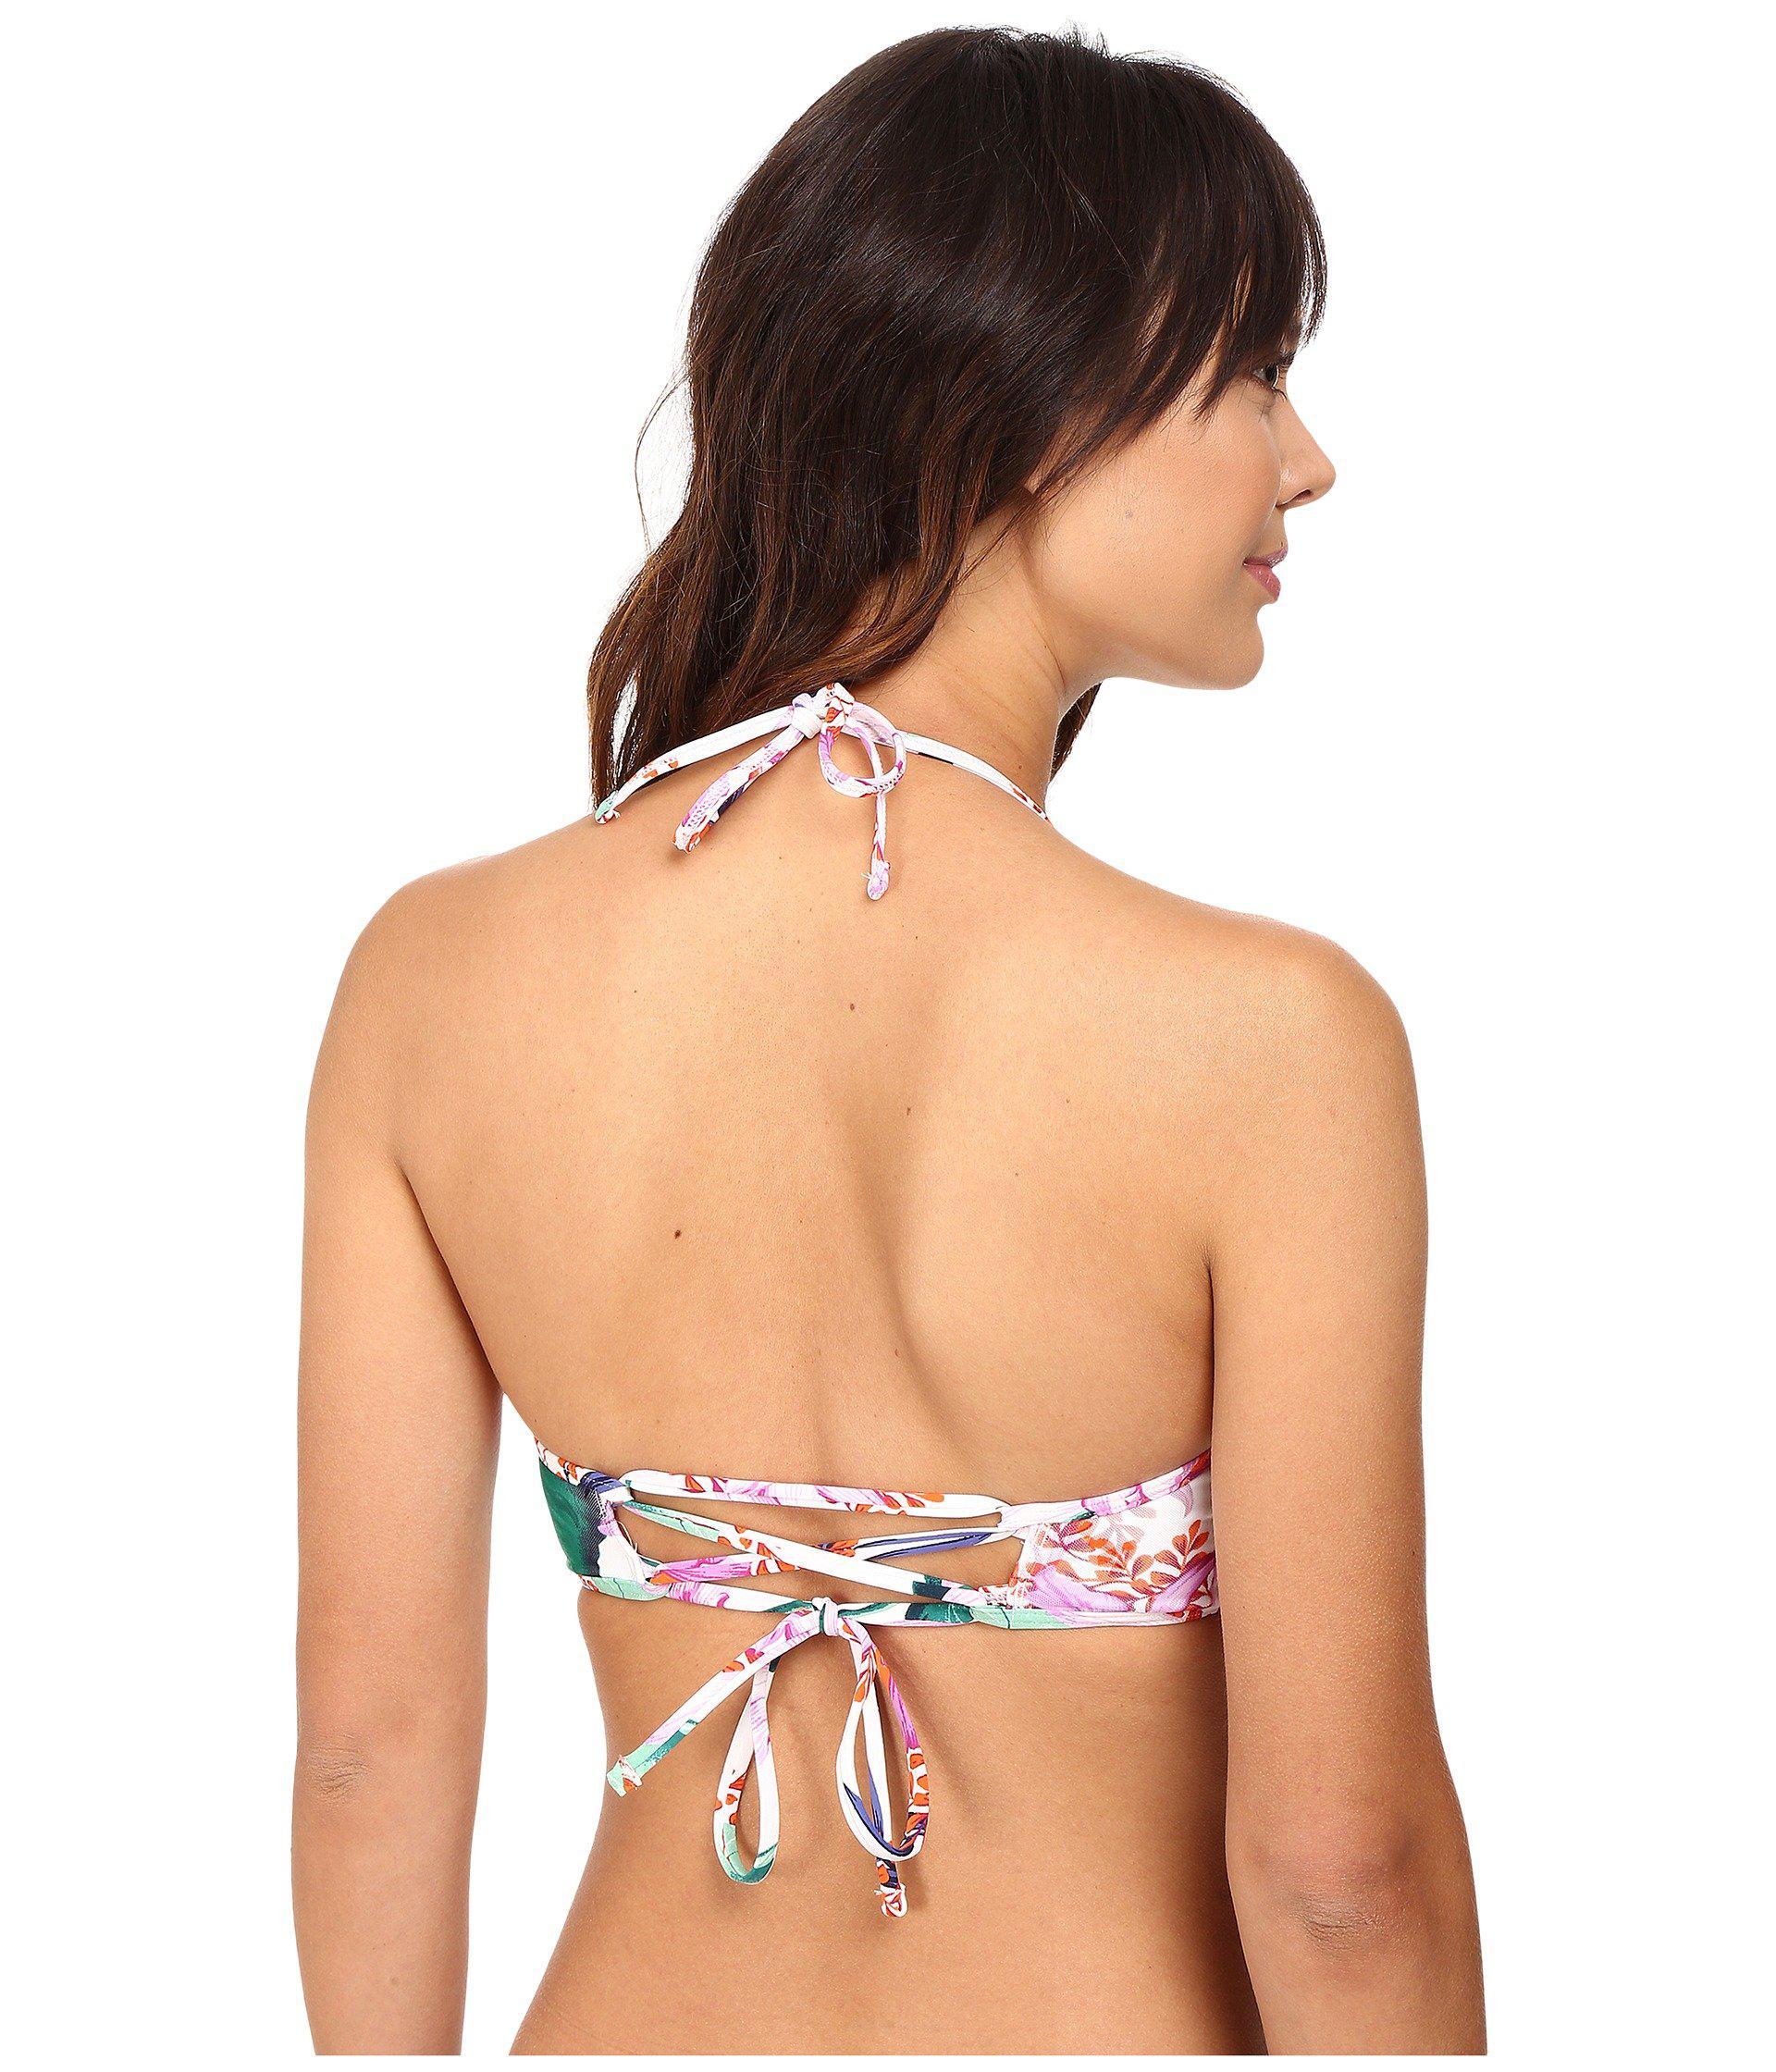 100b7fb132cb1 Tommy Bahama - White Orchid Canopy High-neck Cropped Mesh-overlay Bikini  Top -. View fullscreen